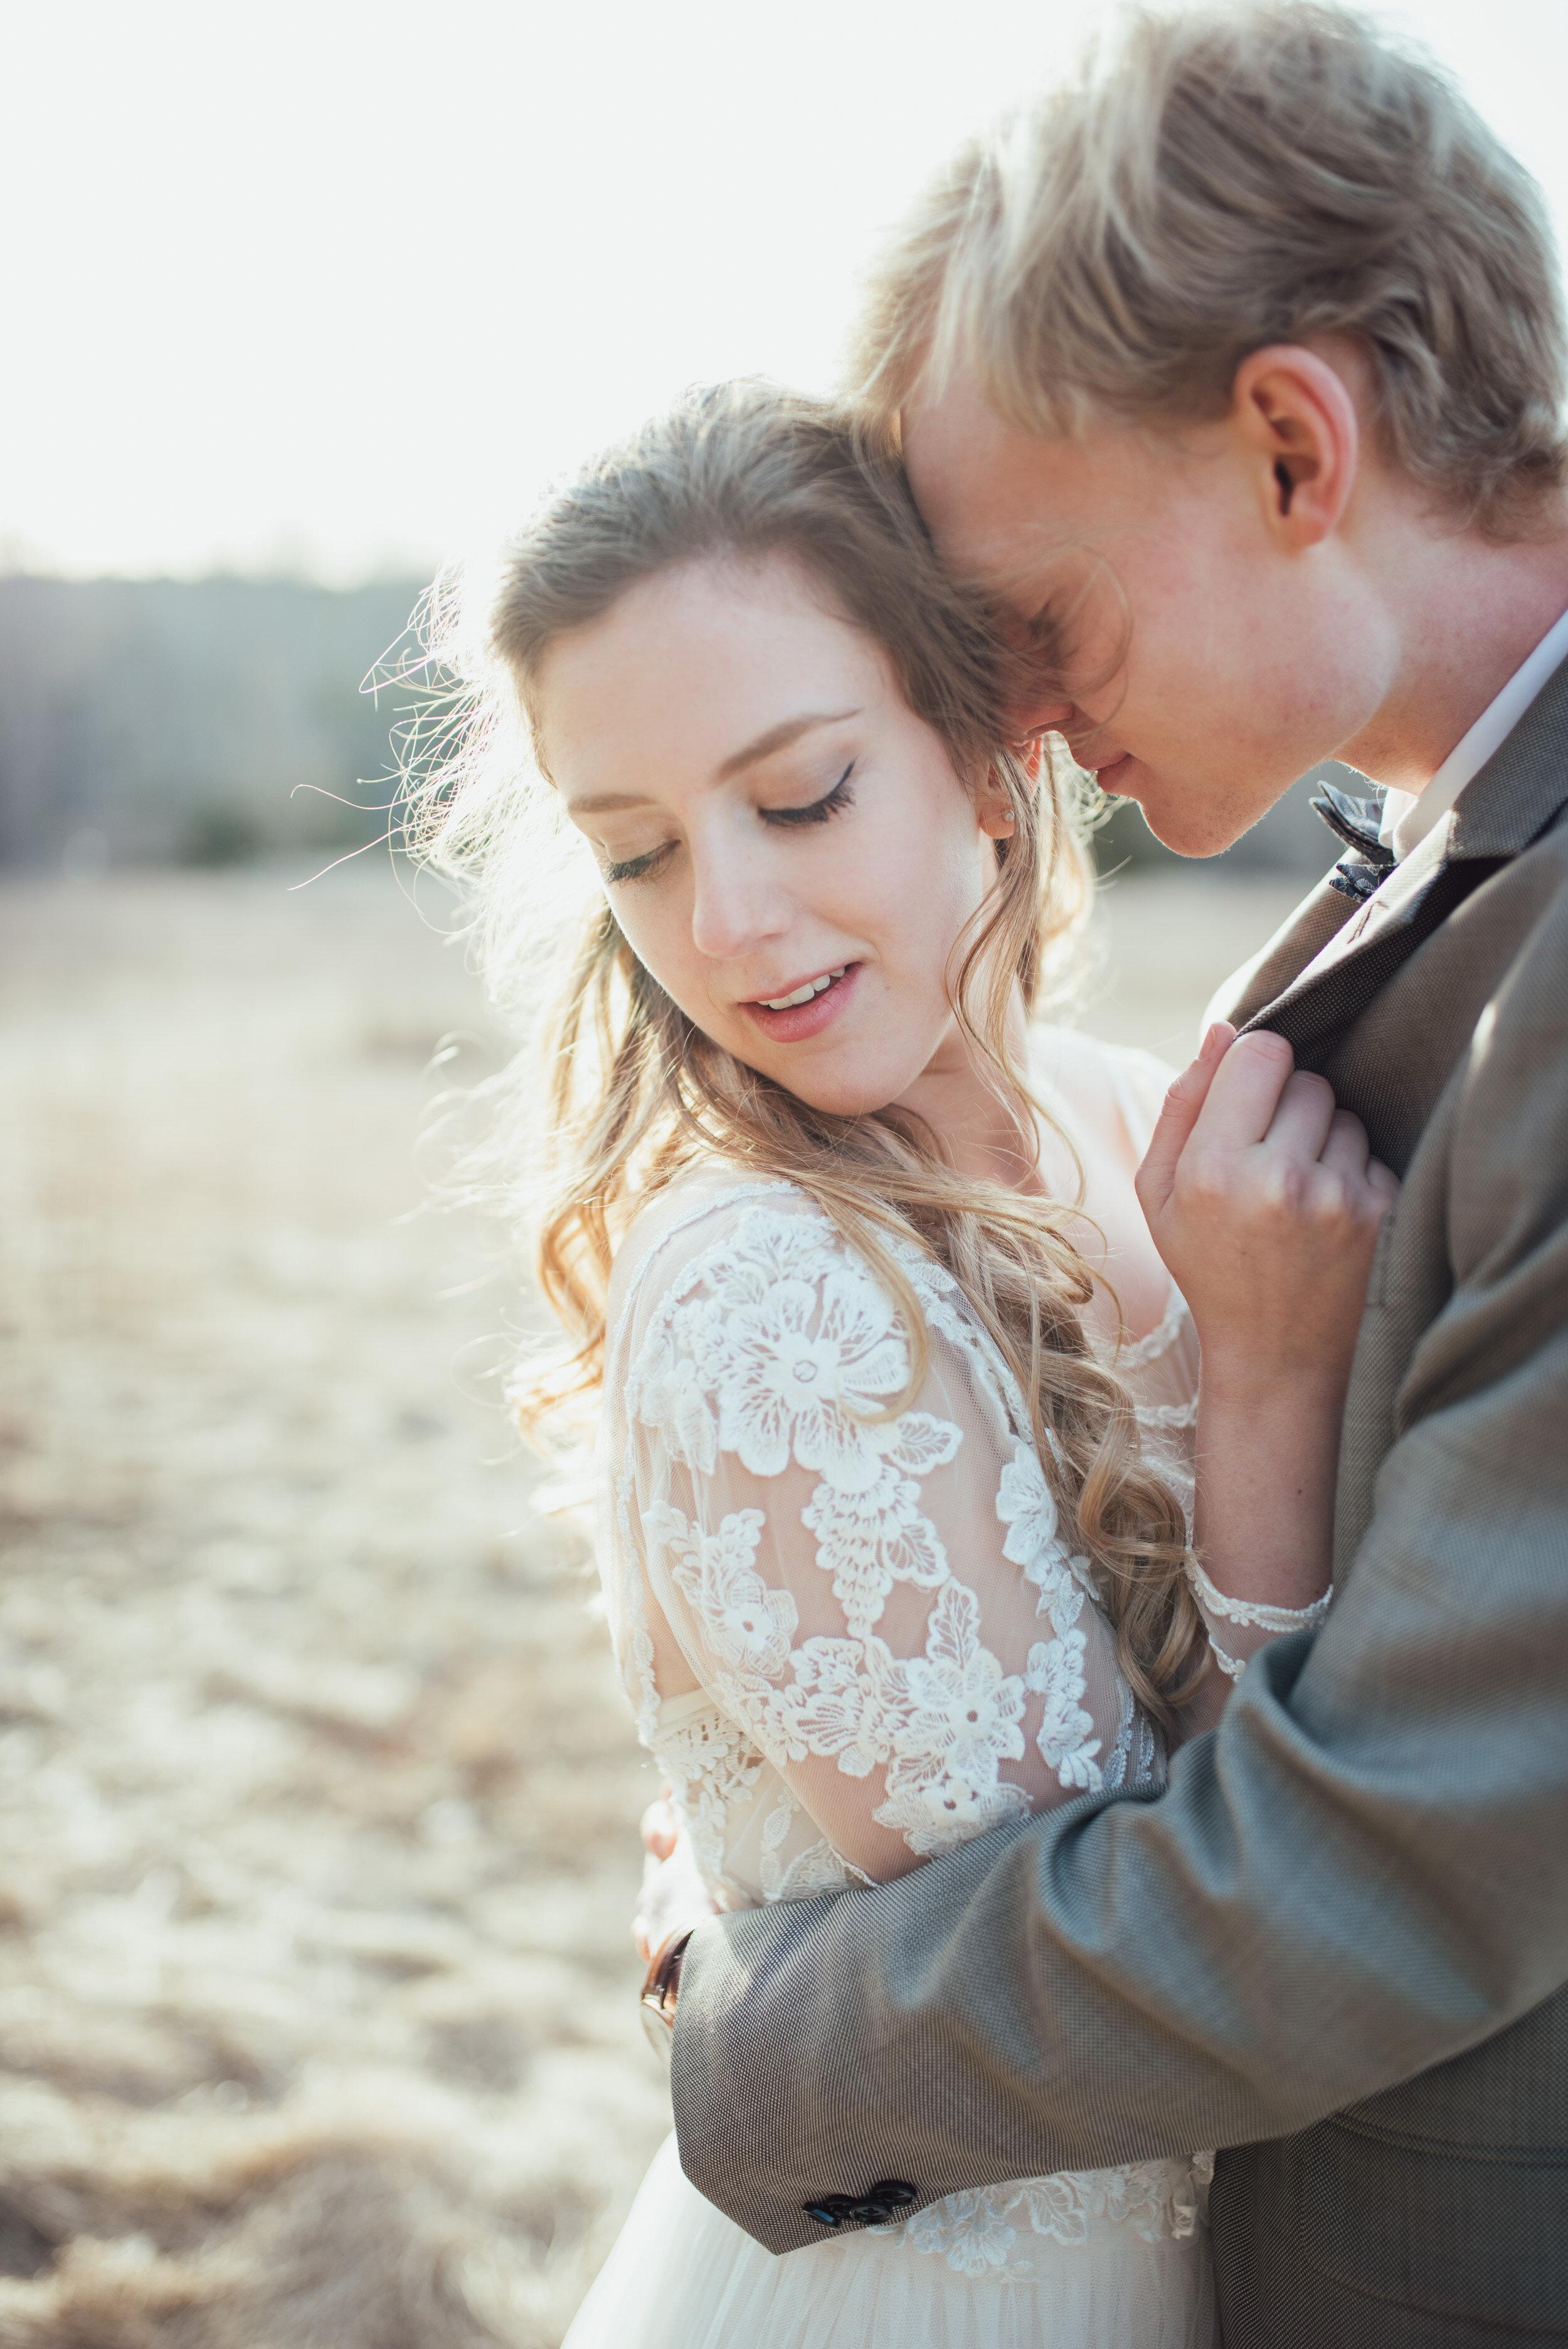 cleland-fine-art-wedding-photography-17.jpg